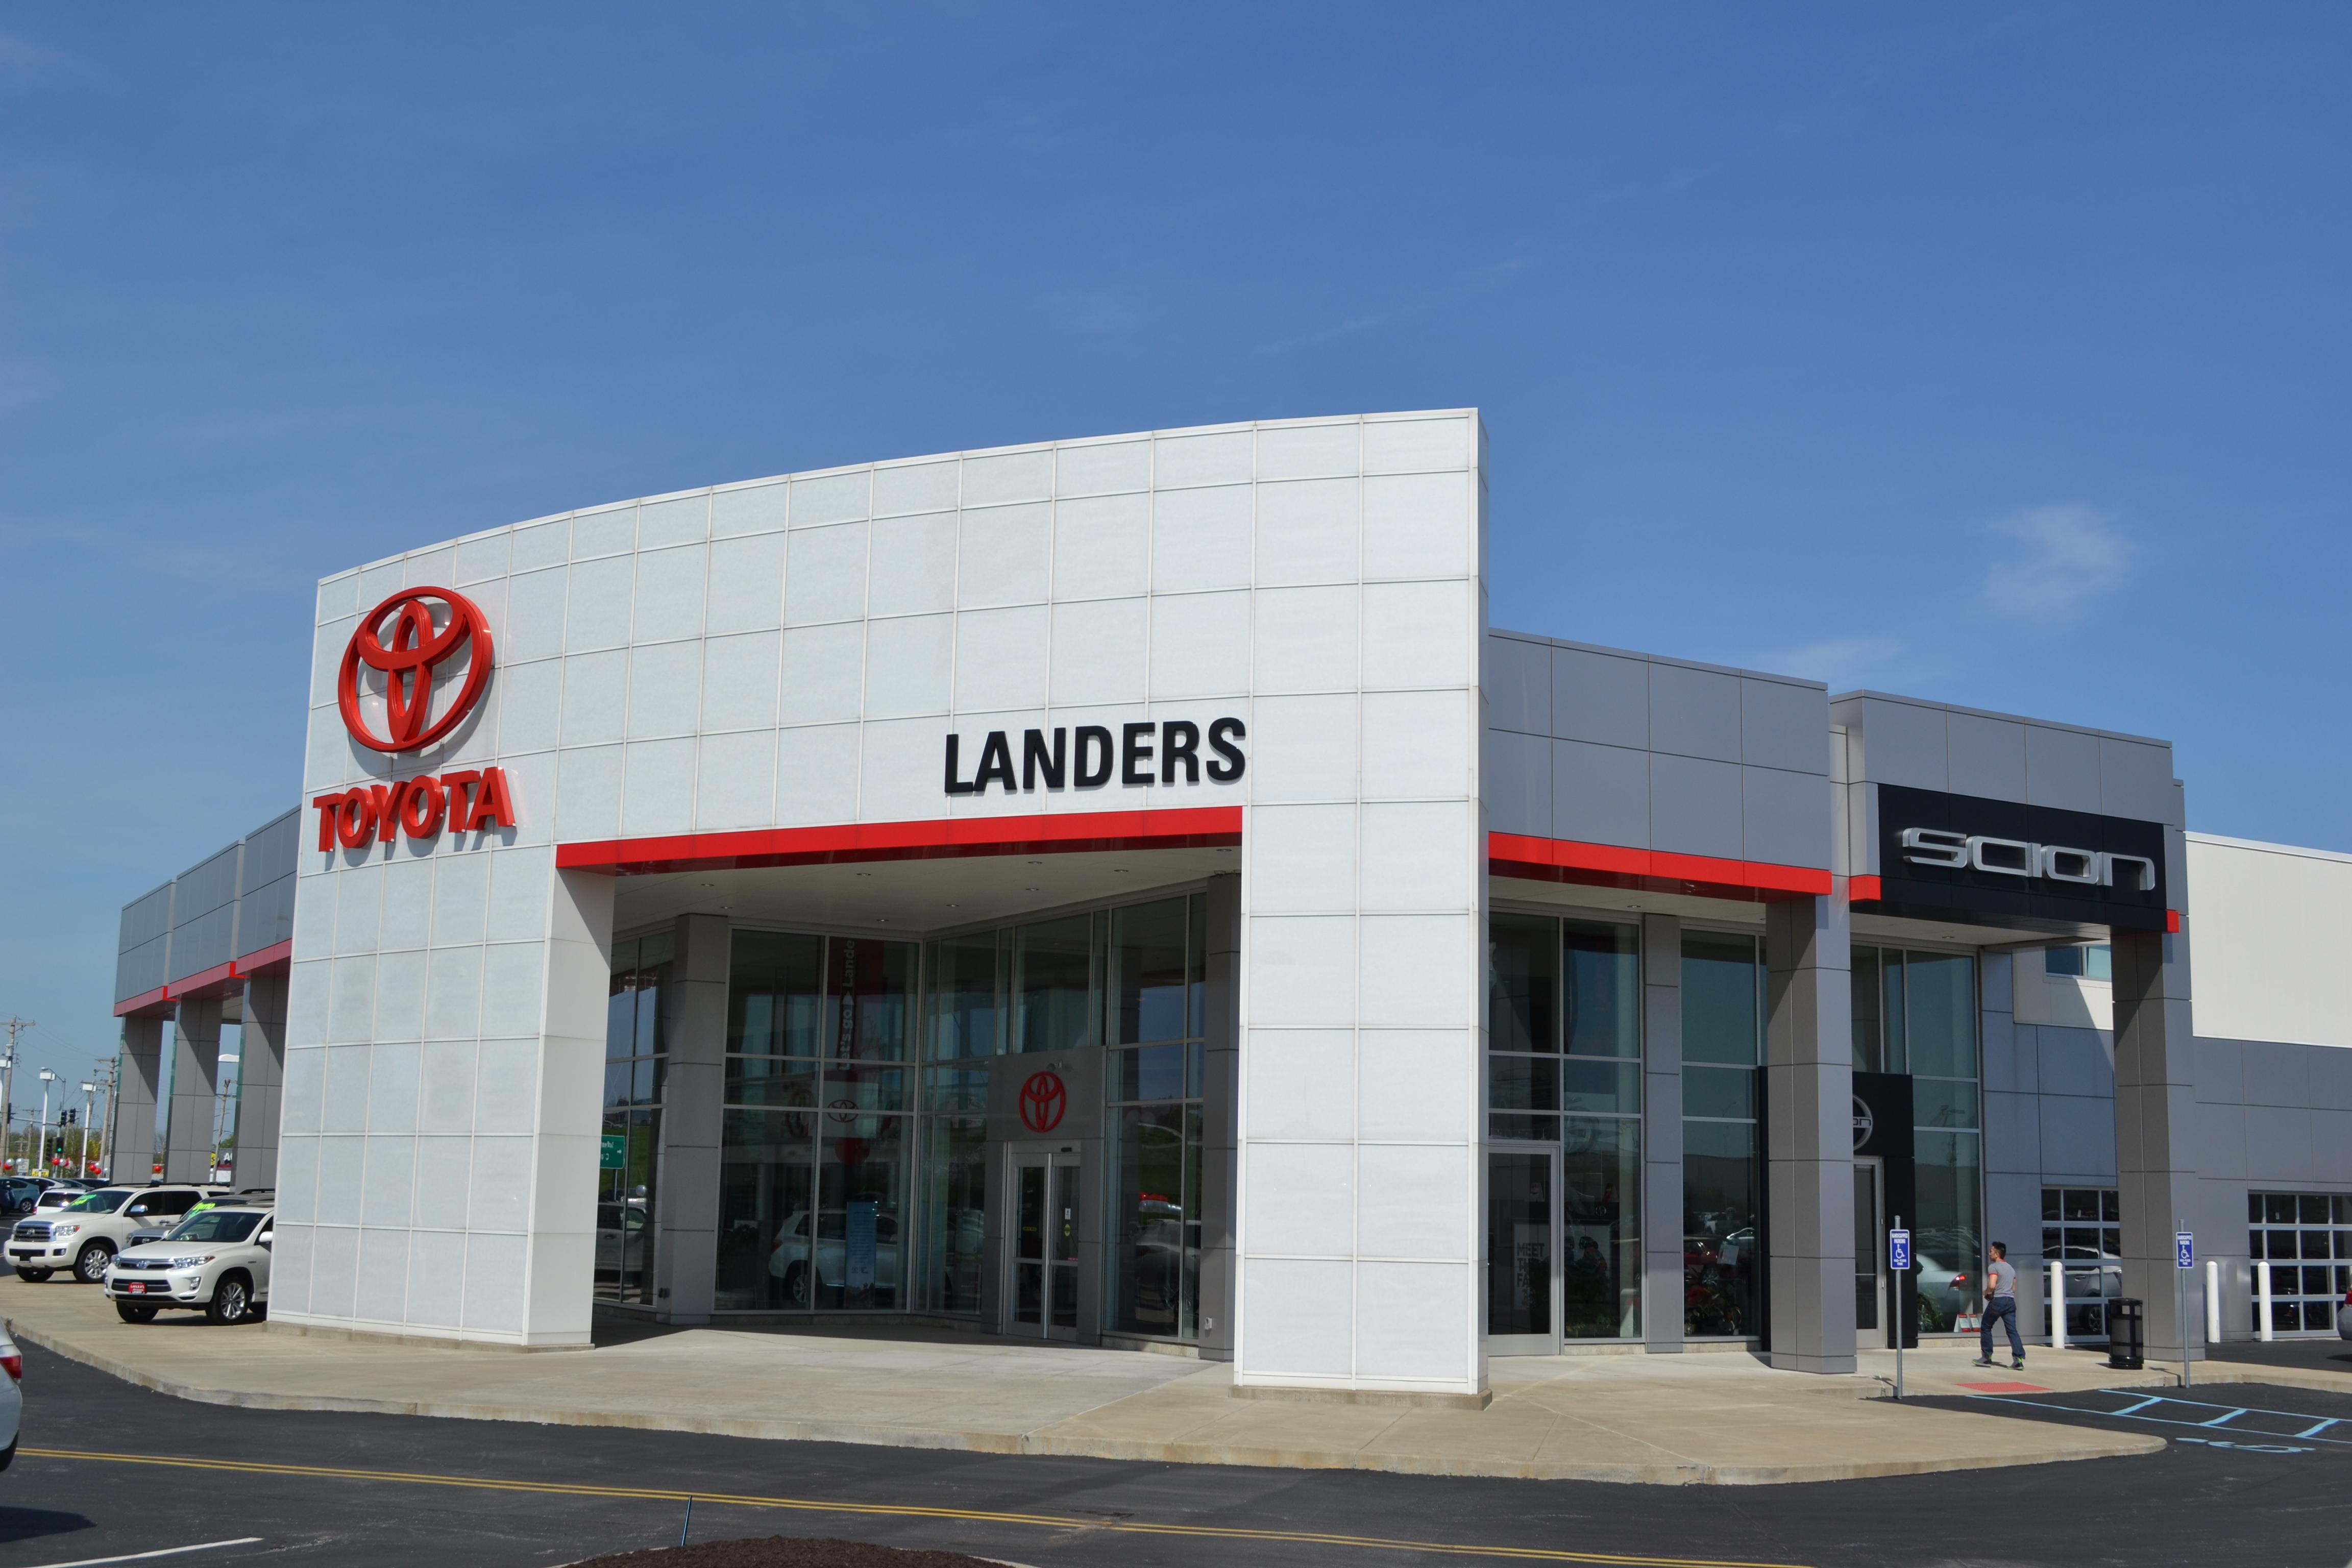 Charming Landers Toyota Of Hazelwood 9091 Dunn Rd, Hazelwood, MO 63042   CLOSED    YP.com